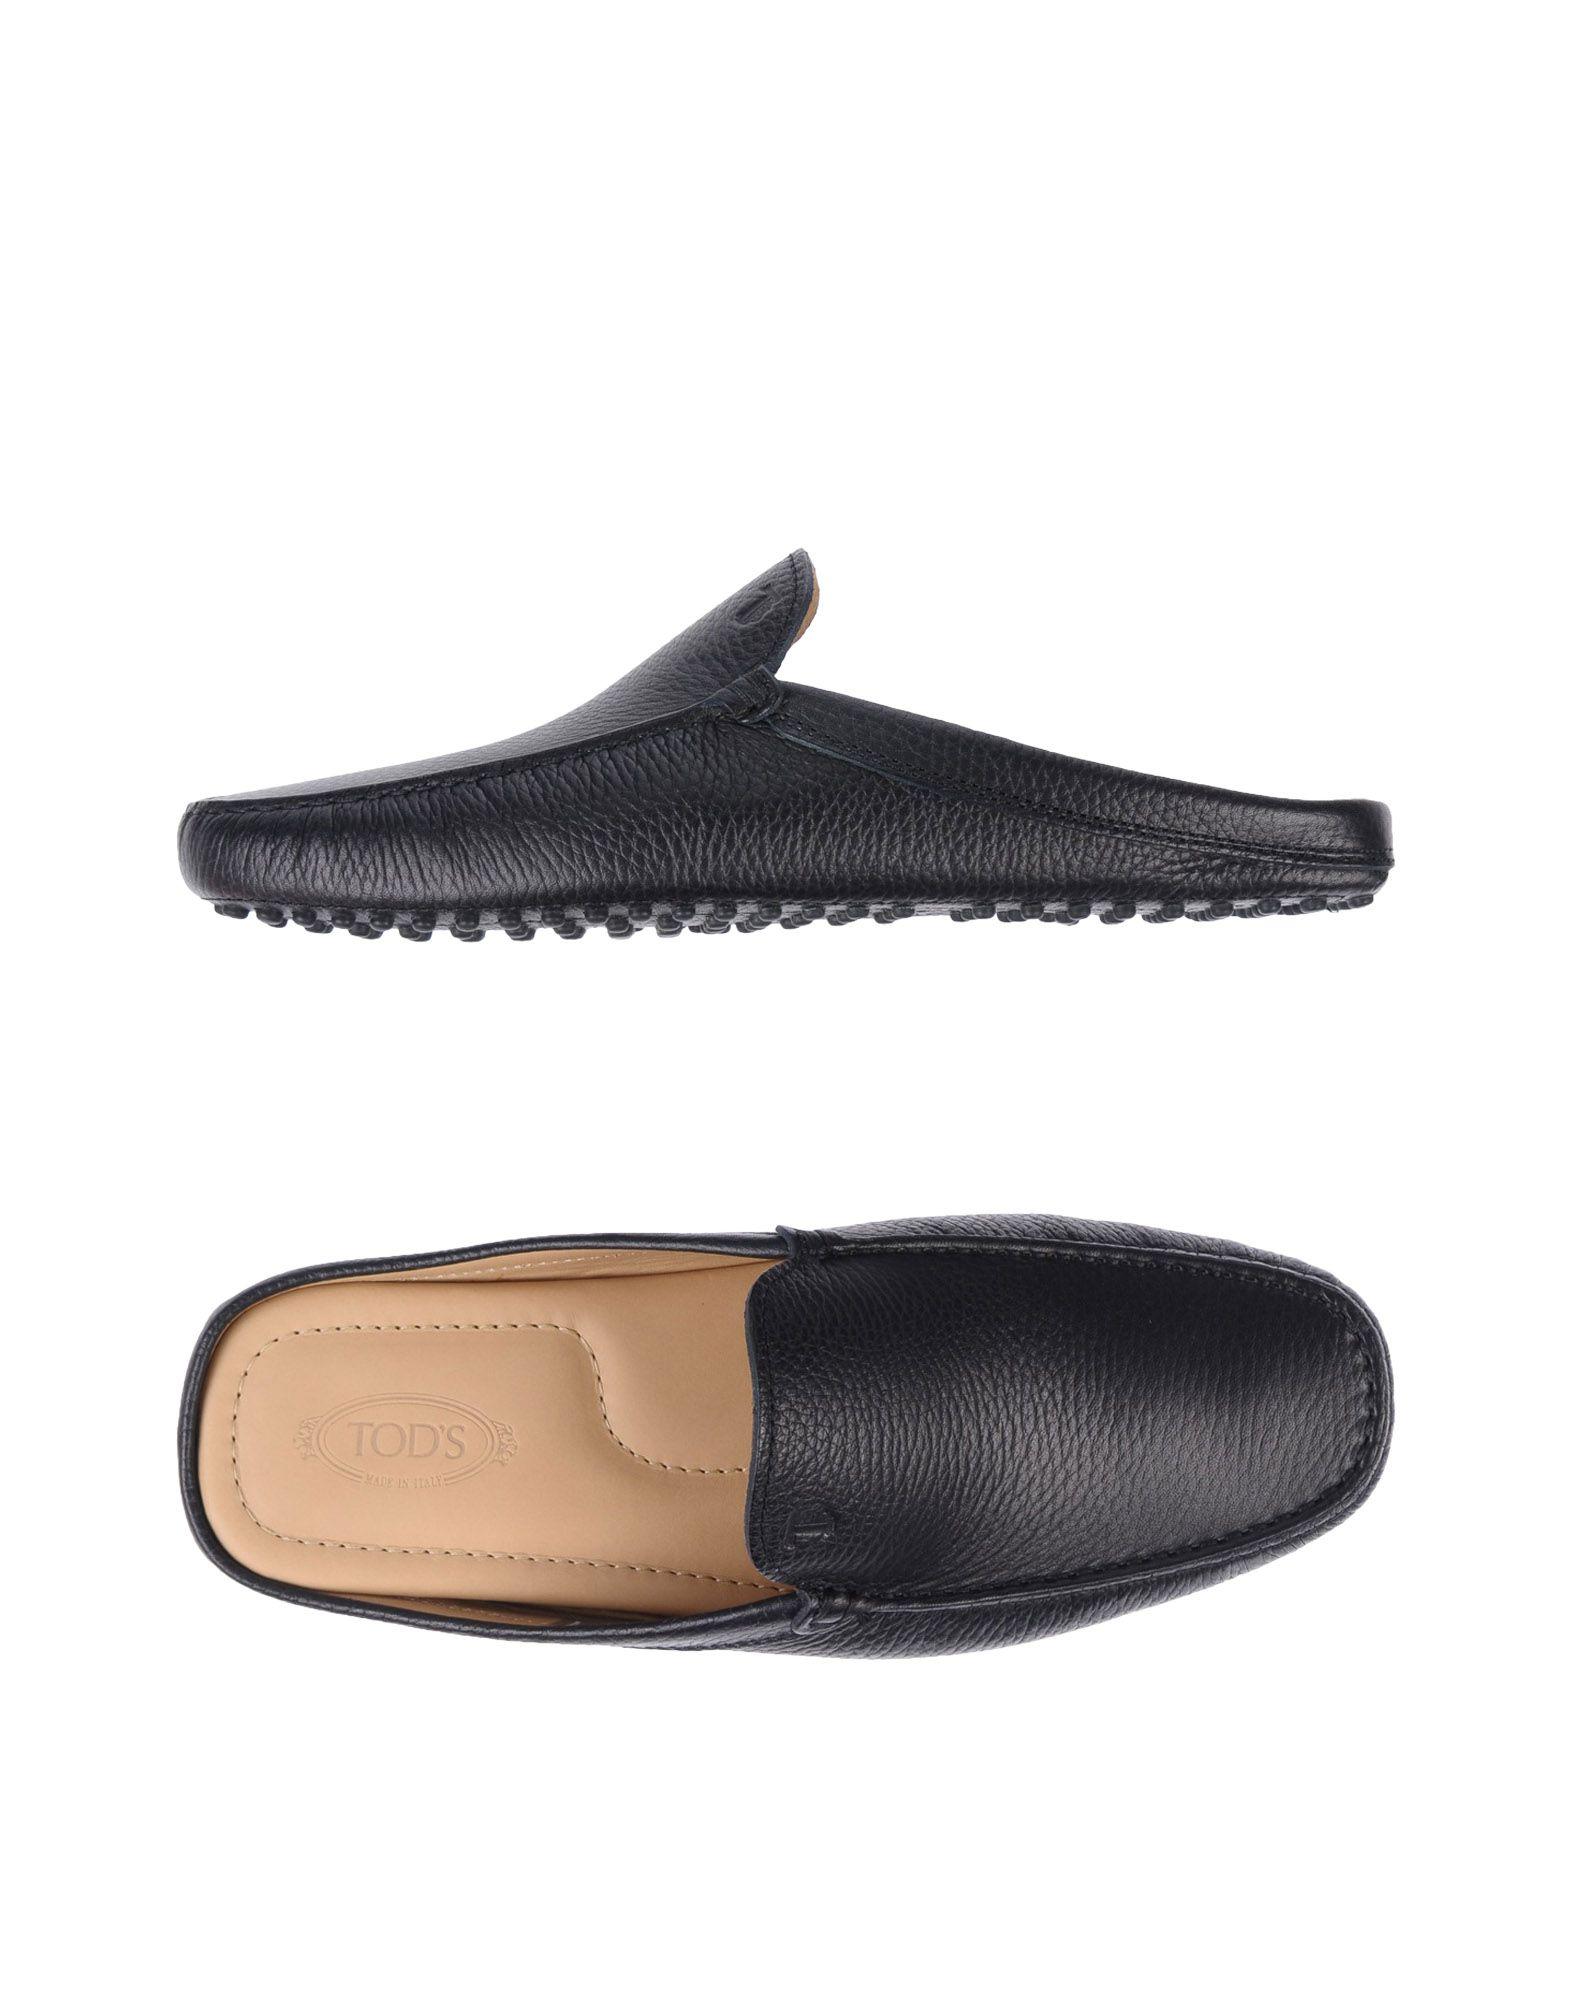 Pantofole Tods Uomo - Acquista online su